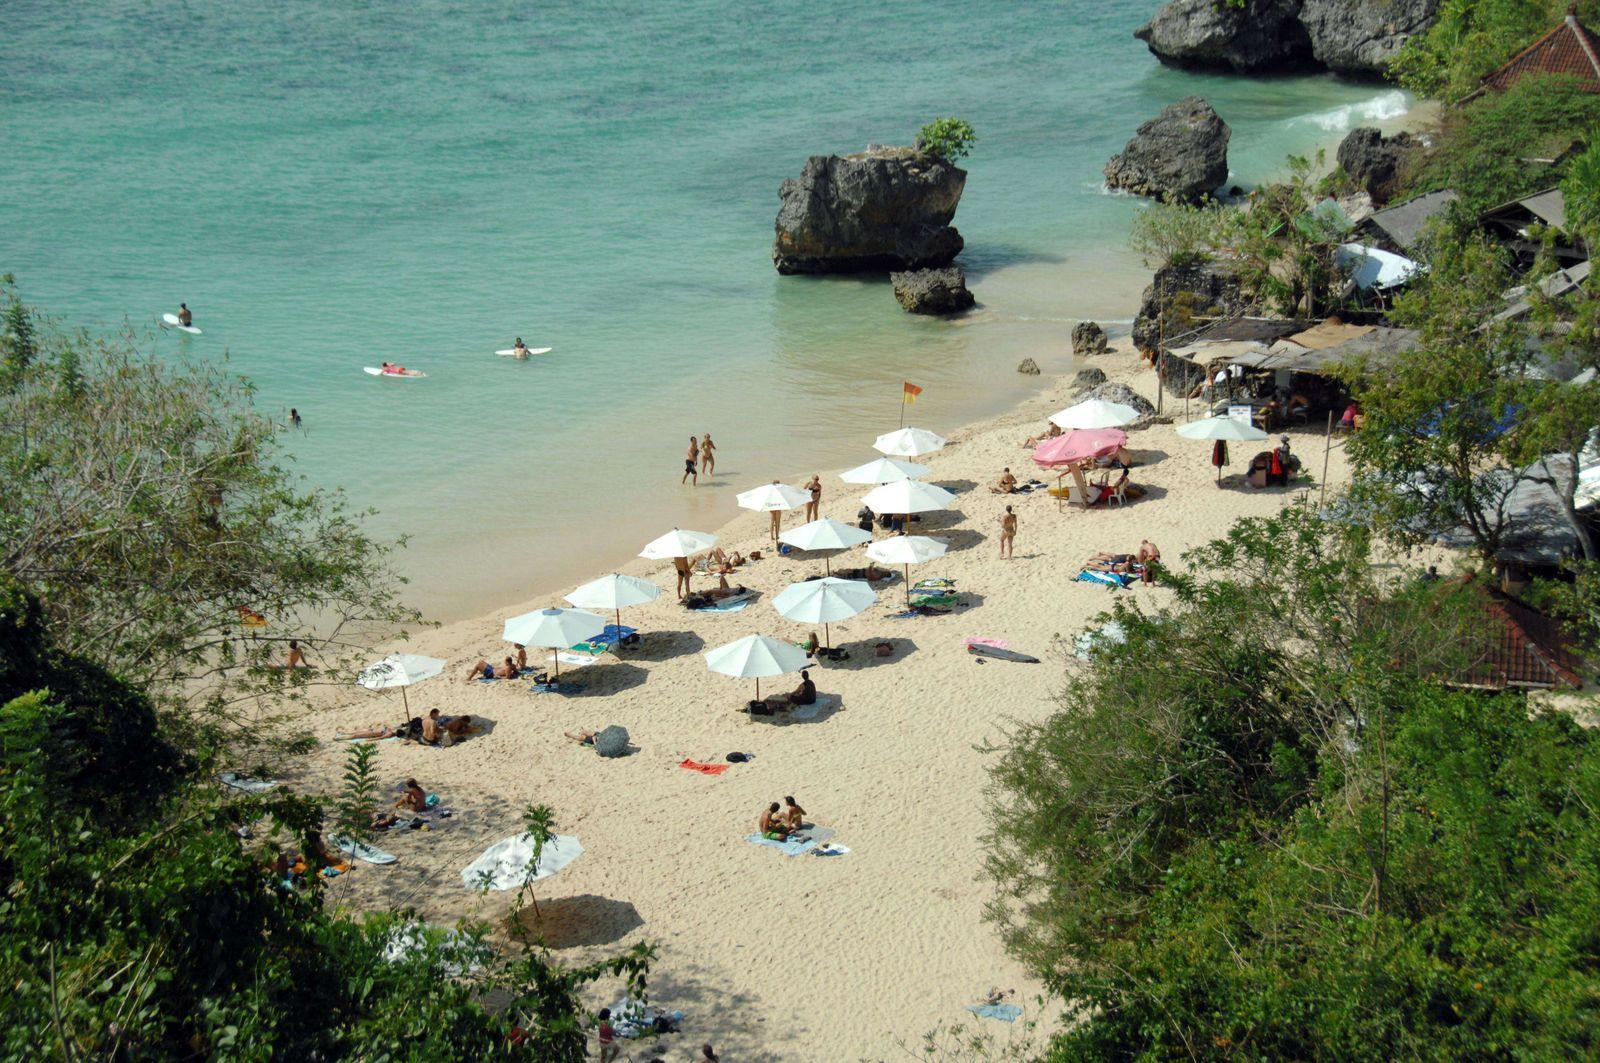 Indonesien / Bali / Strand